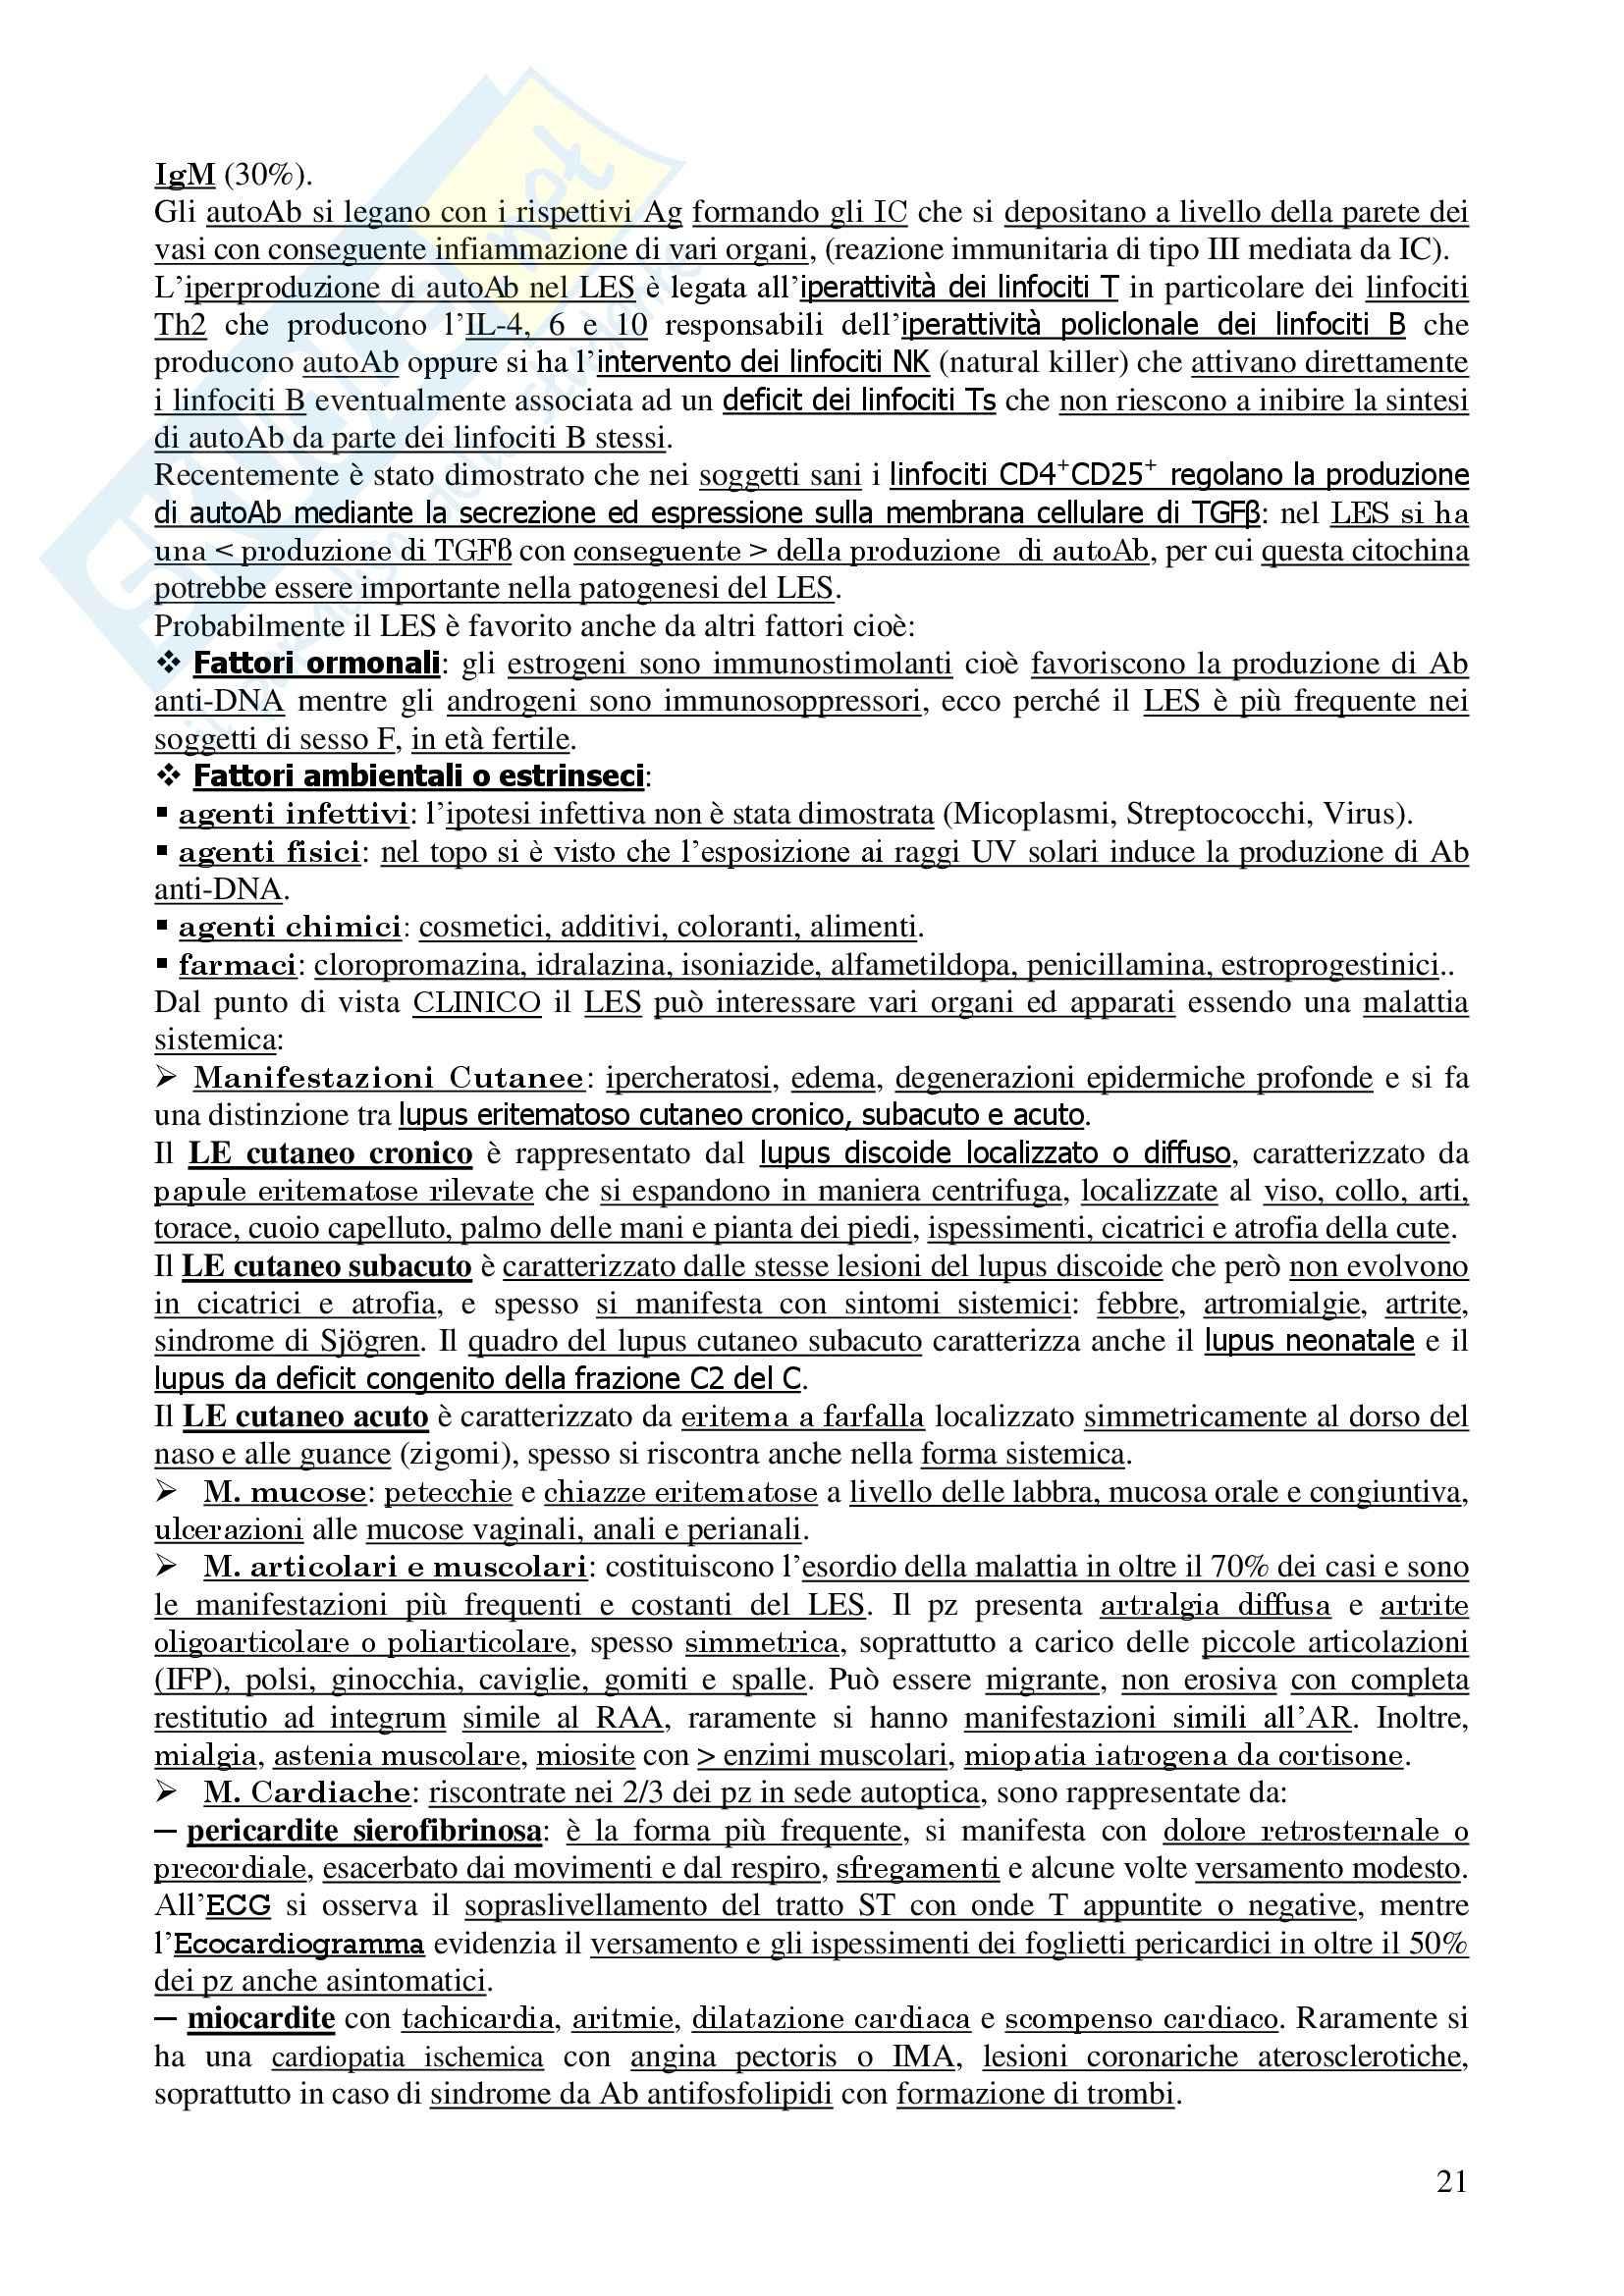 Reumatologia - Corso completo Pag. 21